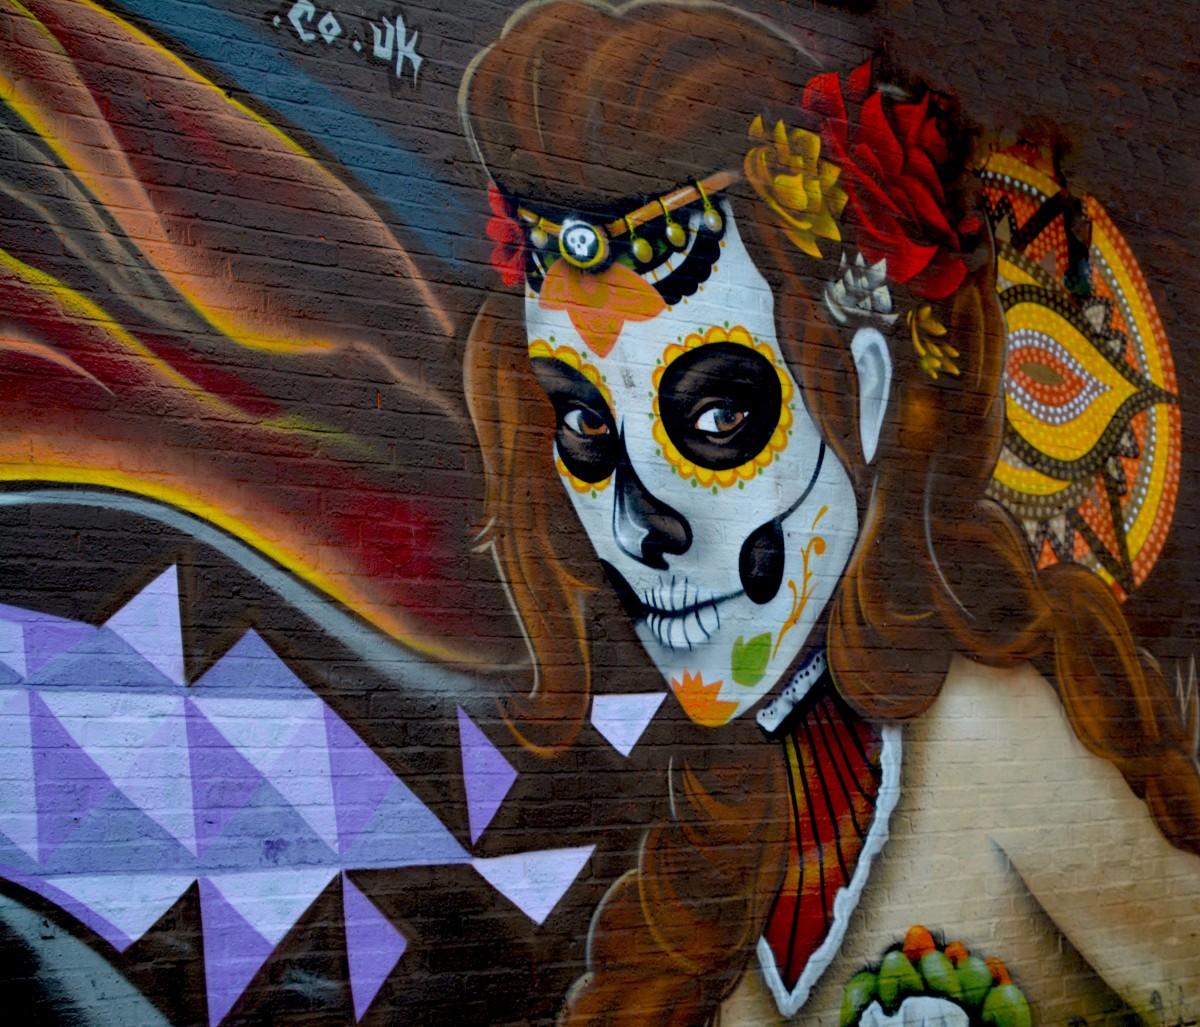 Graffiti wall painting - Creative Girl Woman Hair Street City